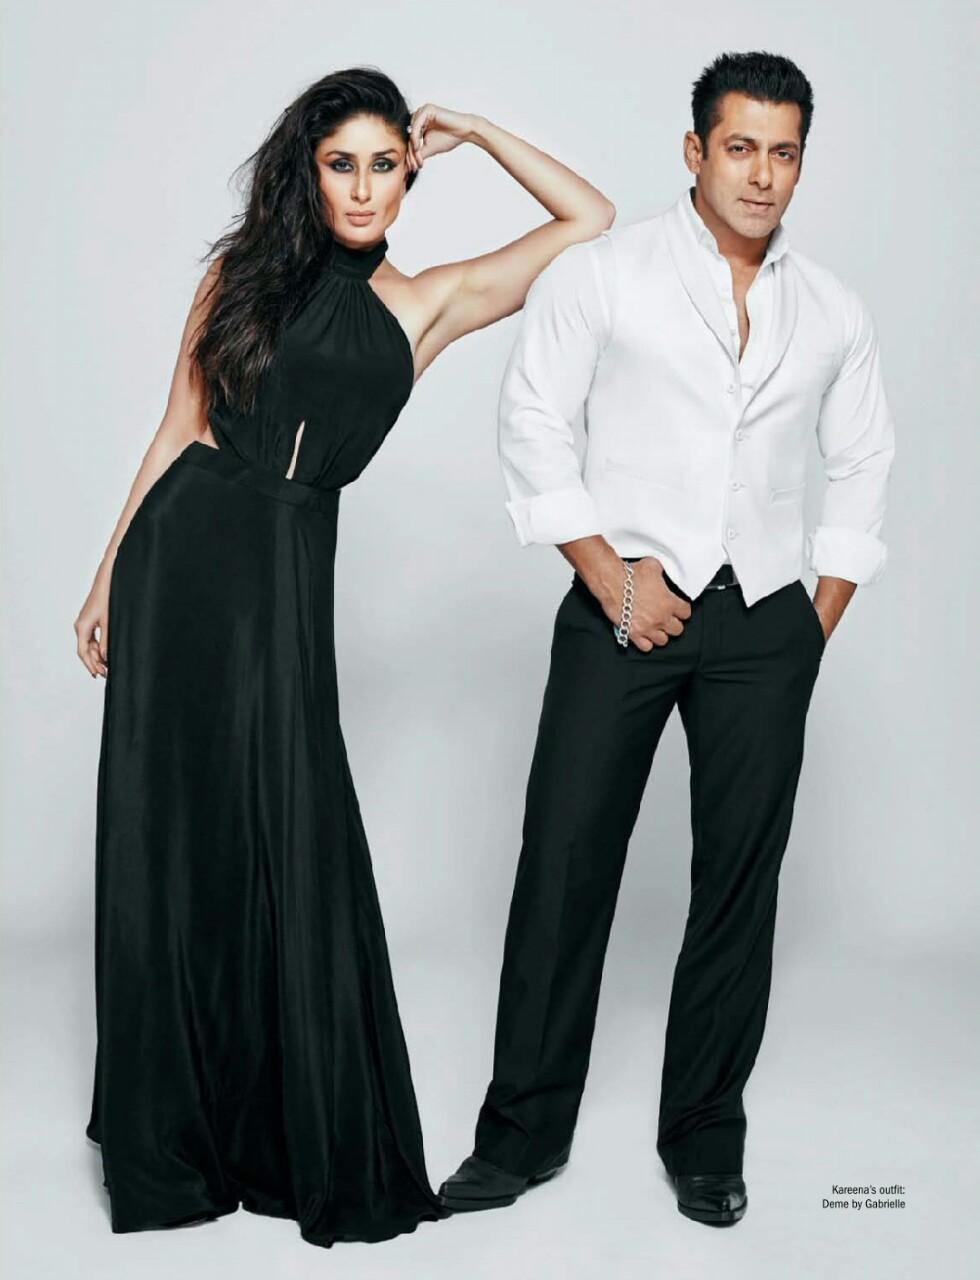 БЕБО - Карина Капур / Kareena Kapoor - Страница 15 Tumblr_nrgm0sdKPh1qm5ly1o4_1280